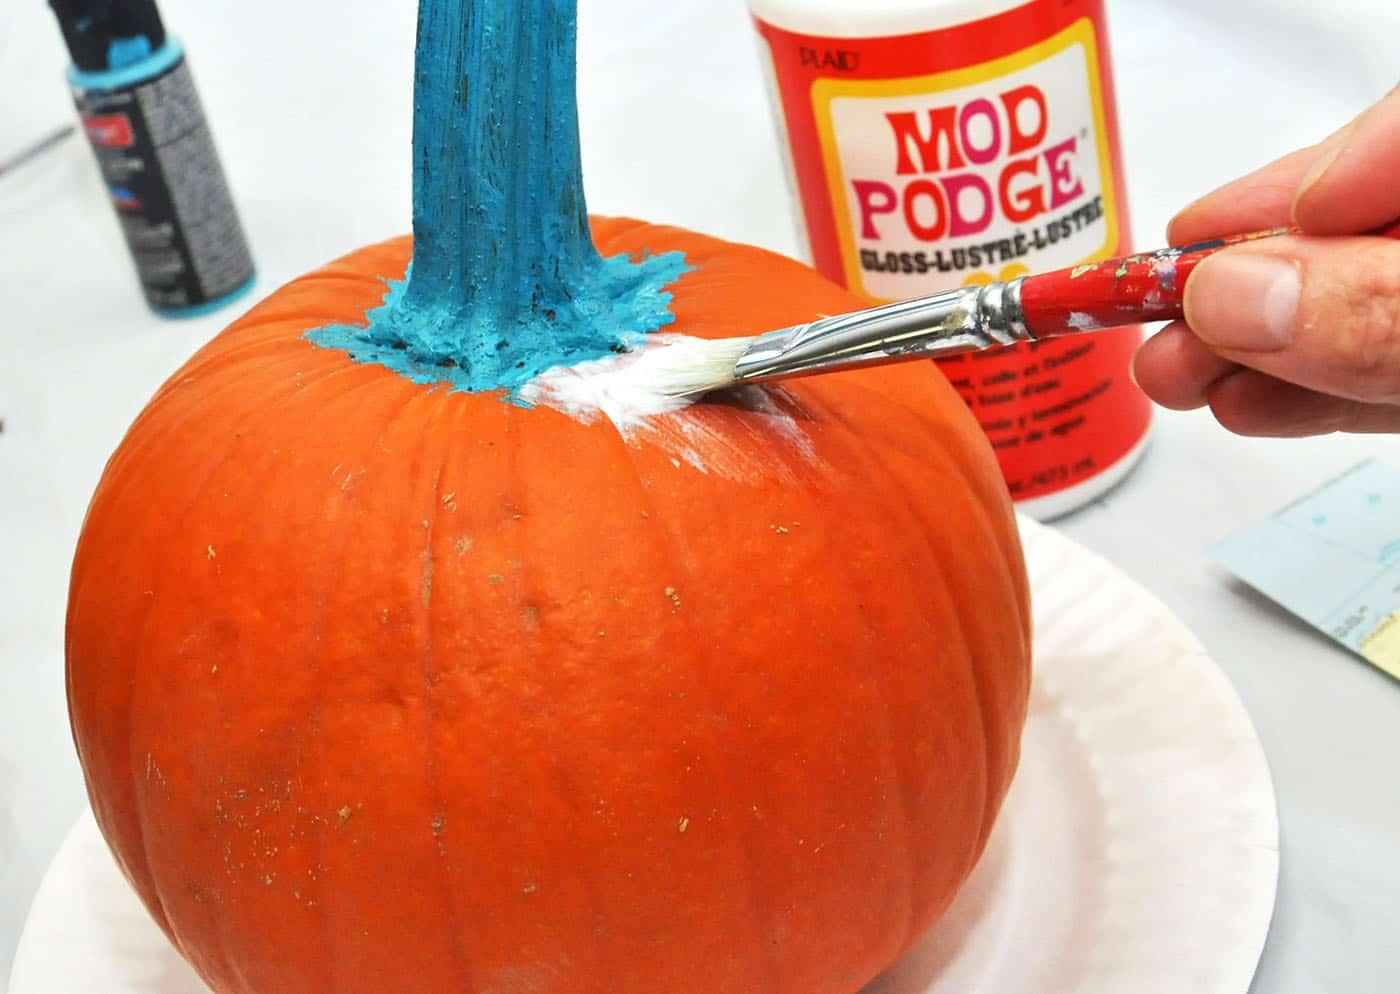 Applying Mod Podge to a pumpkin